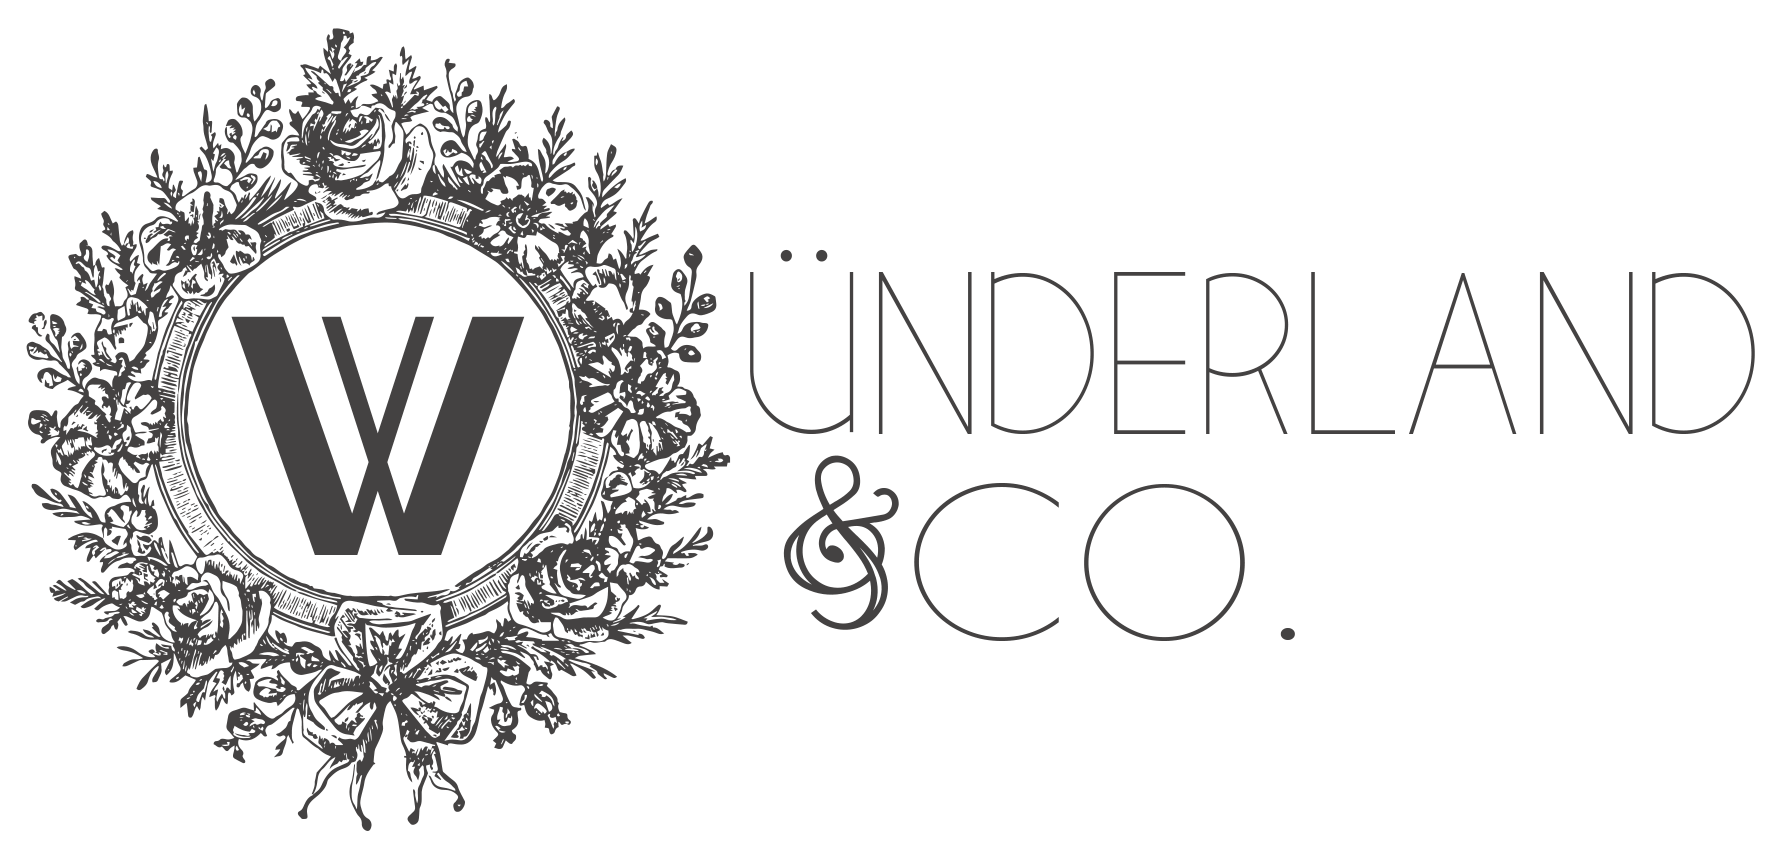 wunderlandco.com